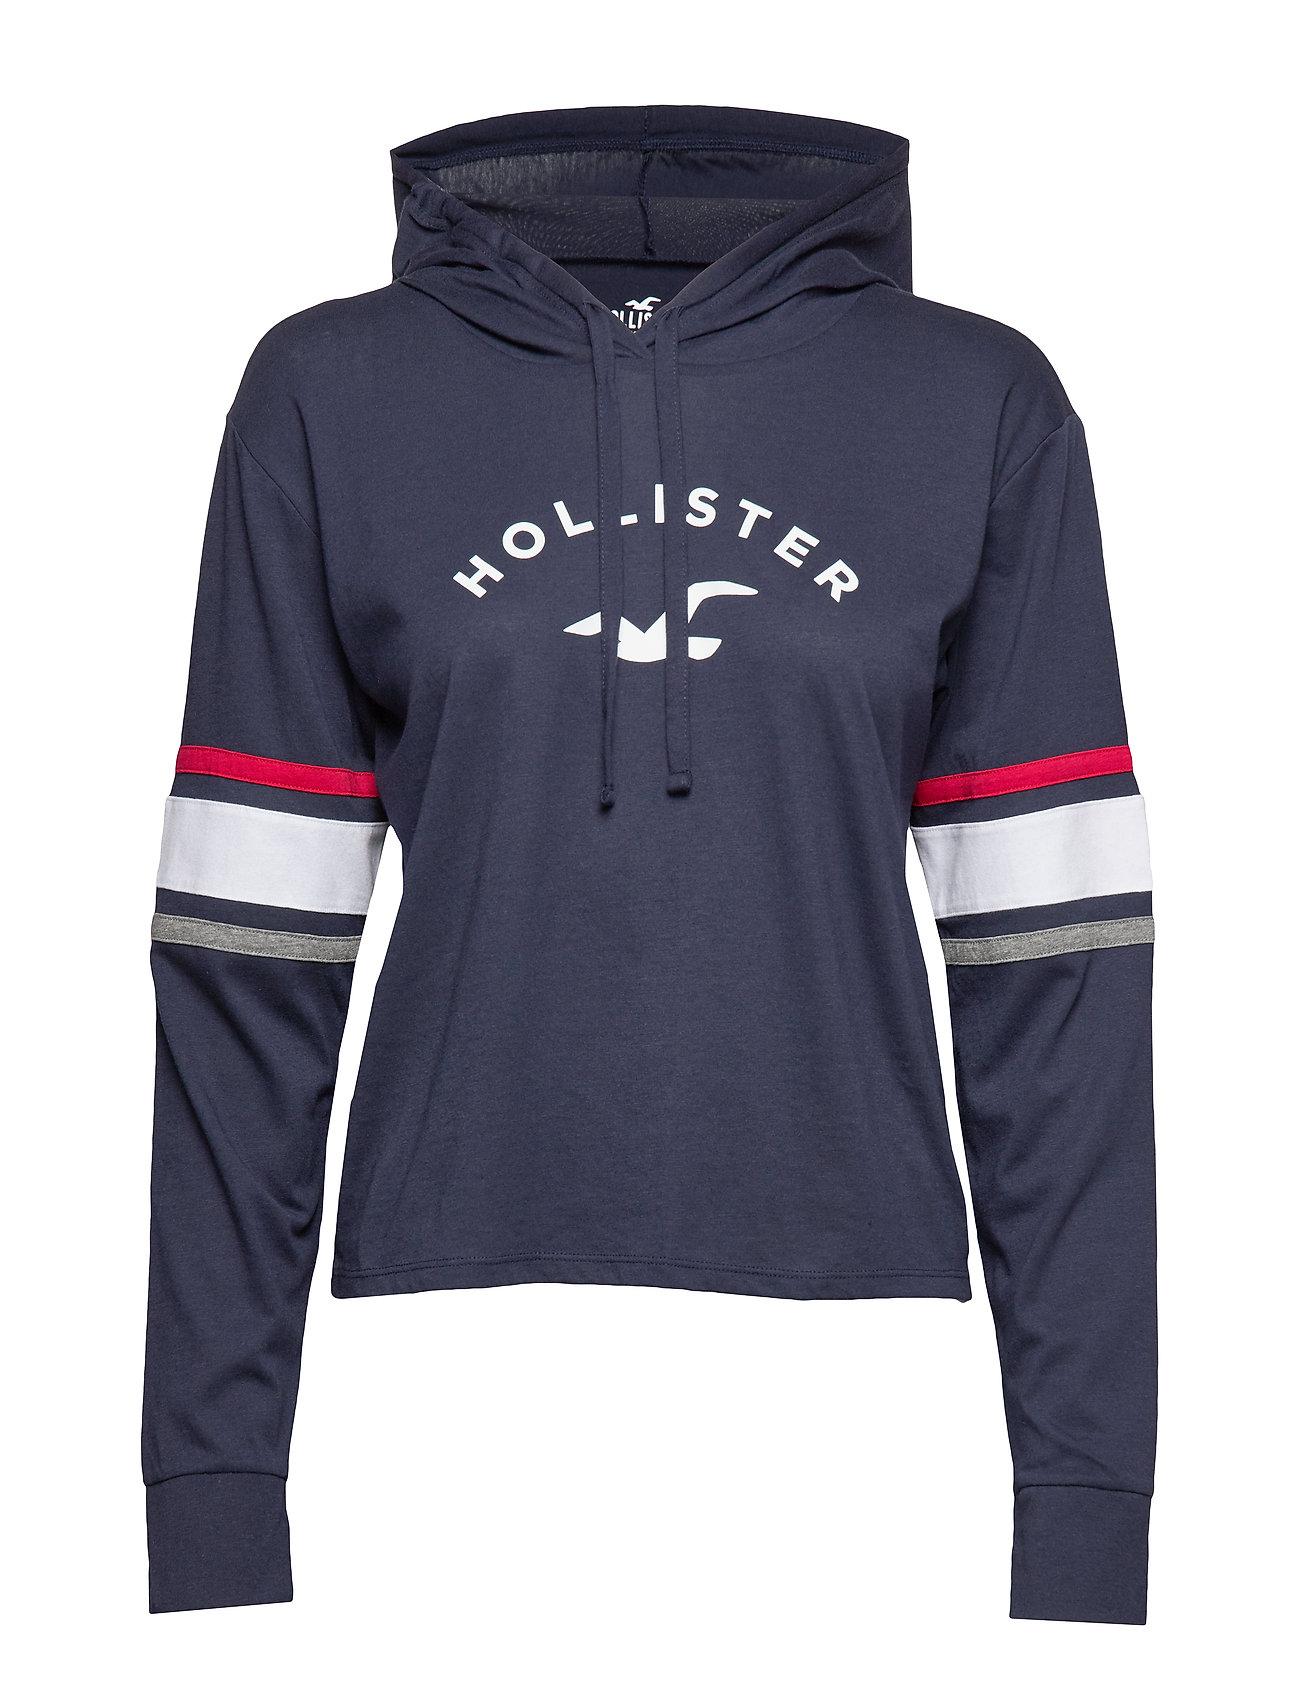 Hollister Hoodie - NAVY DD